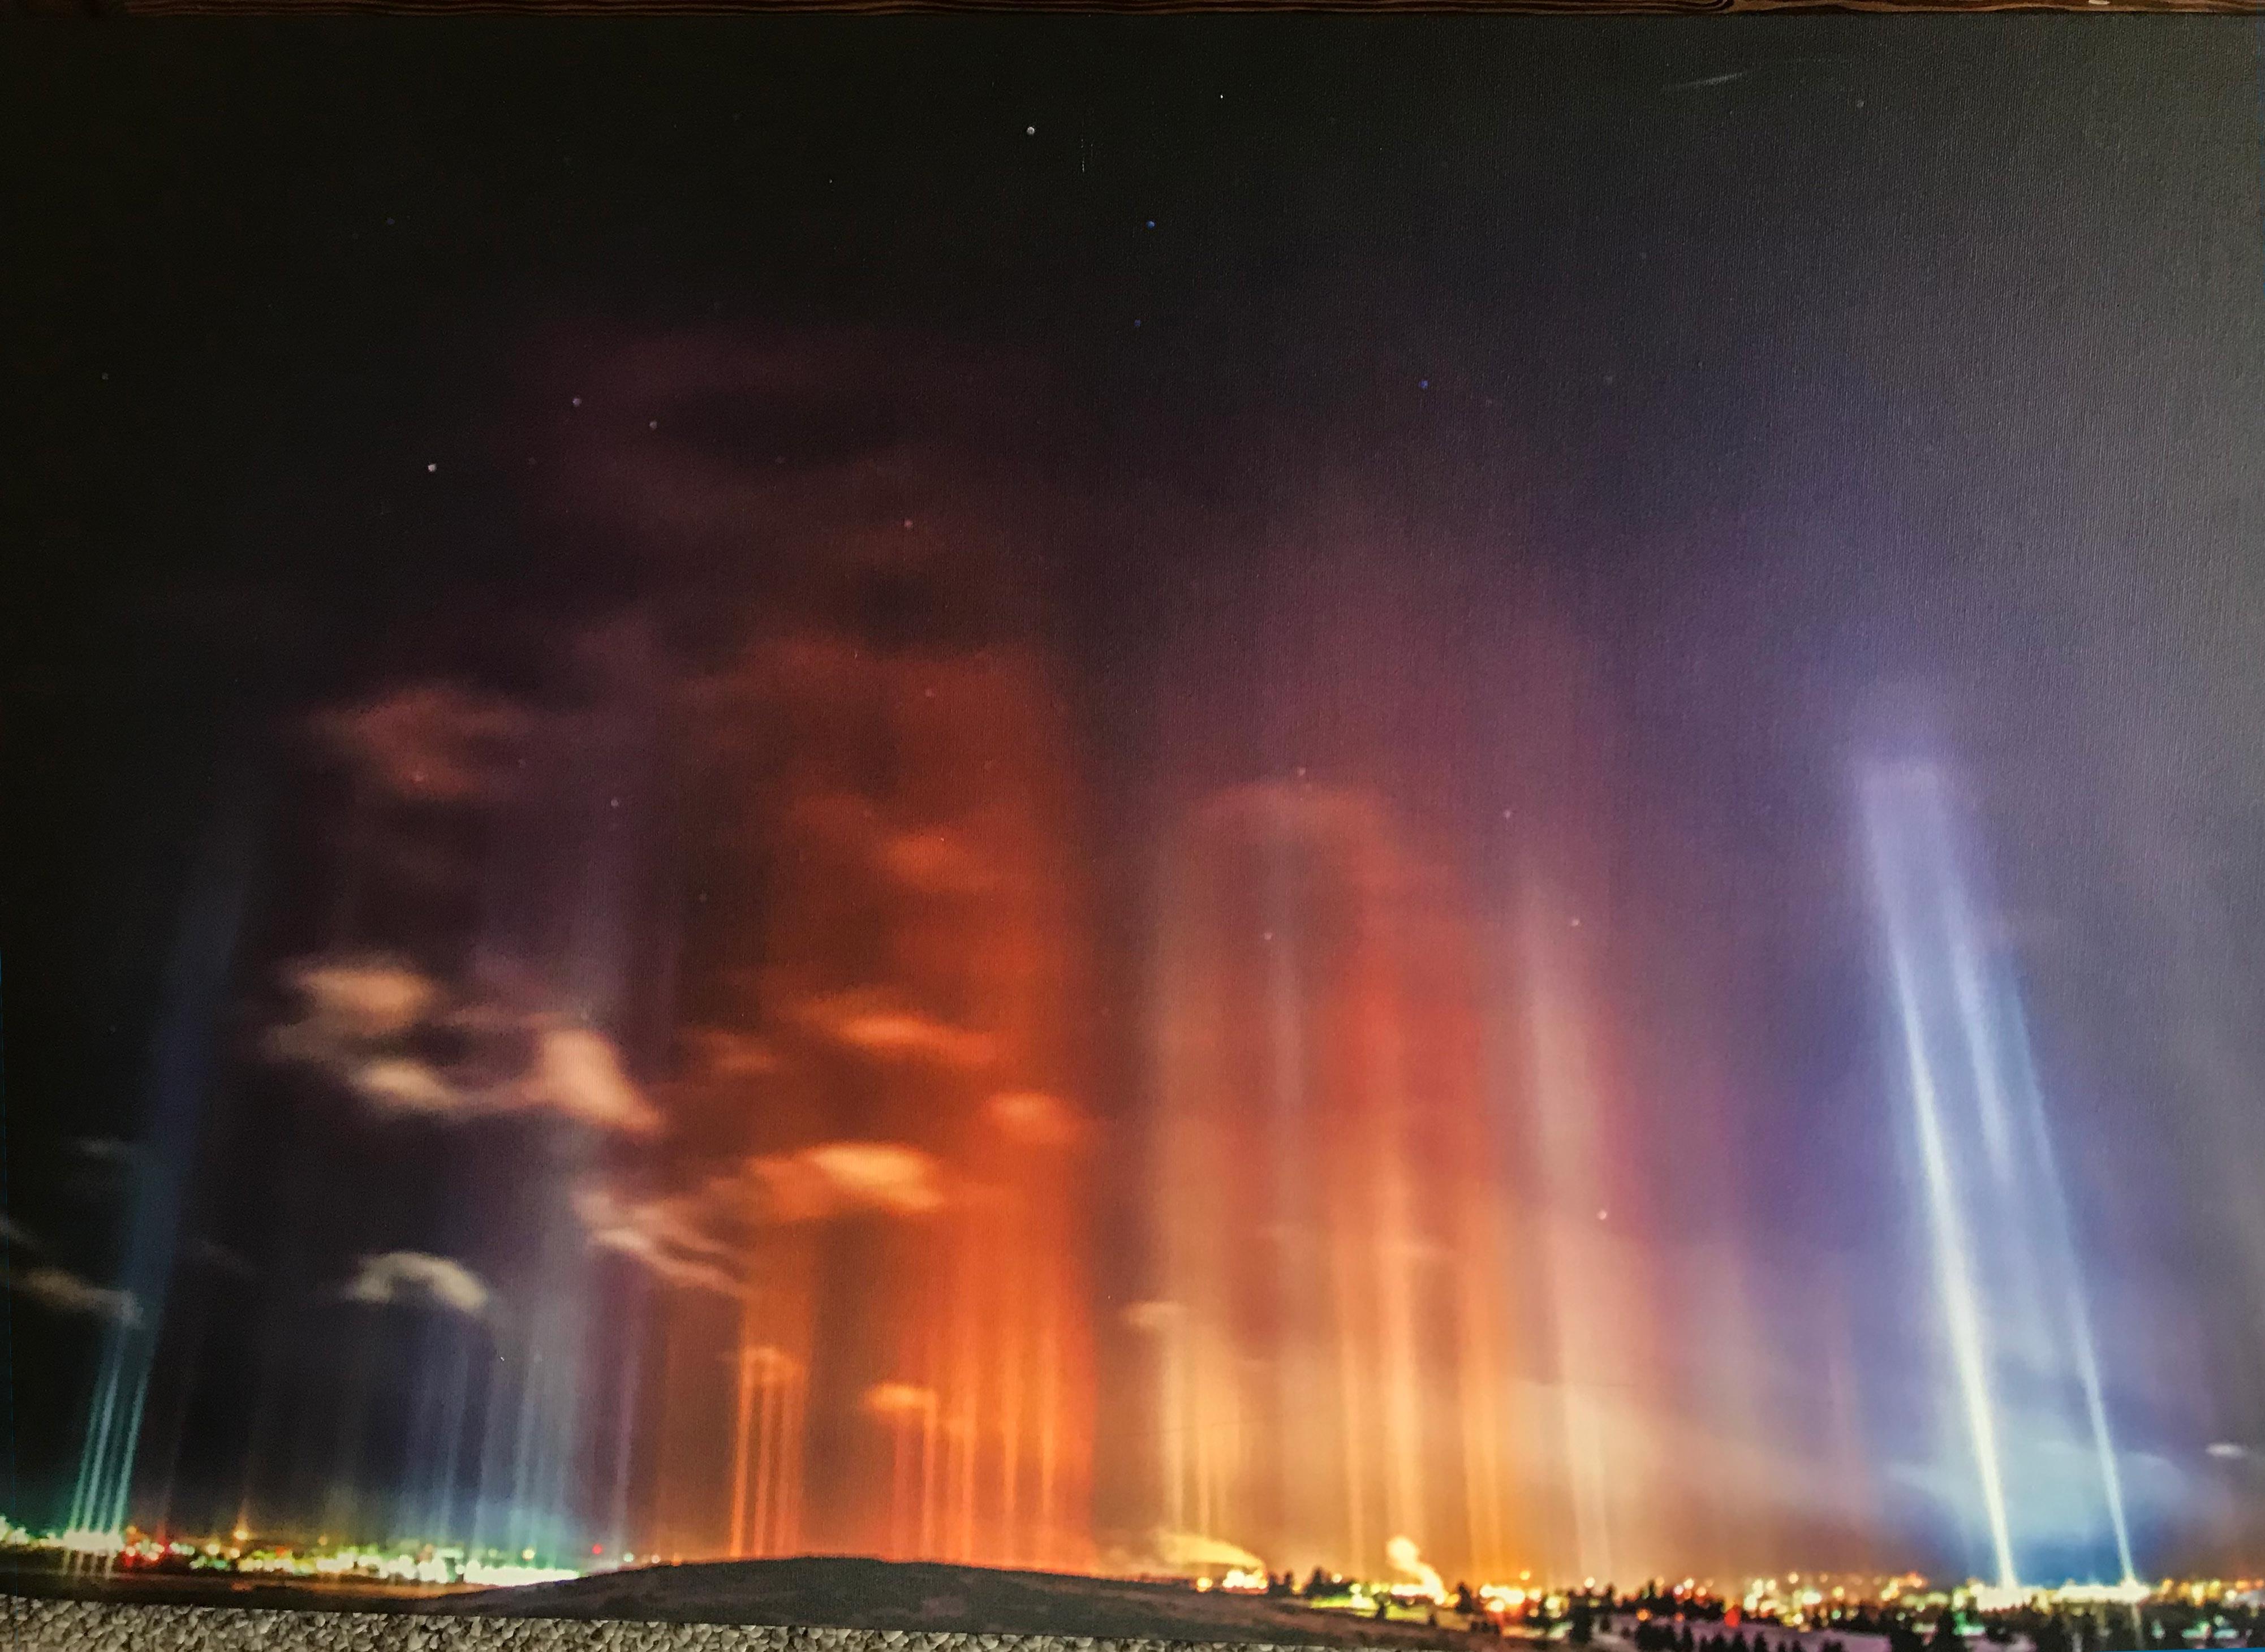 Light Pillars Over Laramie - Robert Kirkwood